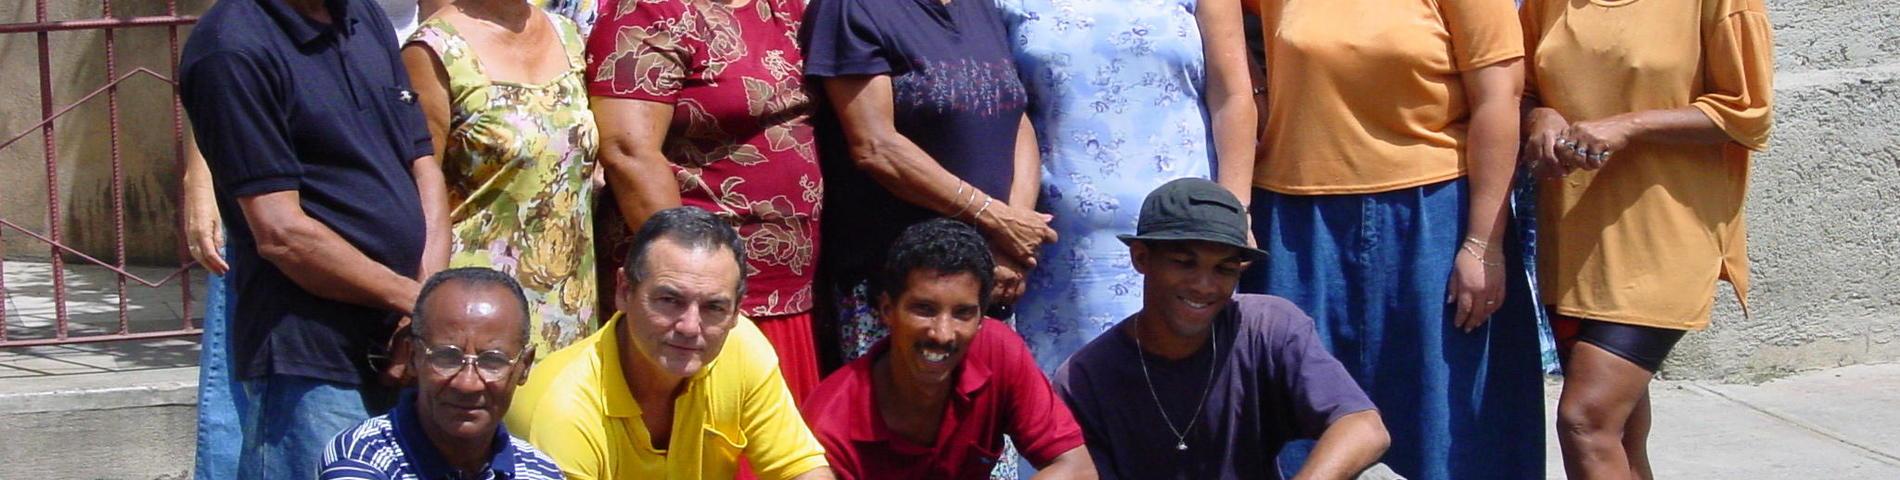 StudyTeam Cuba bilde 1